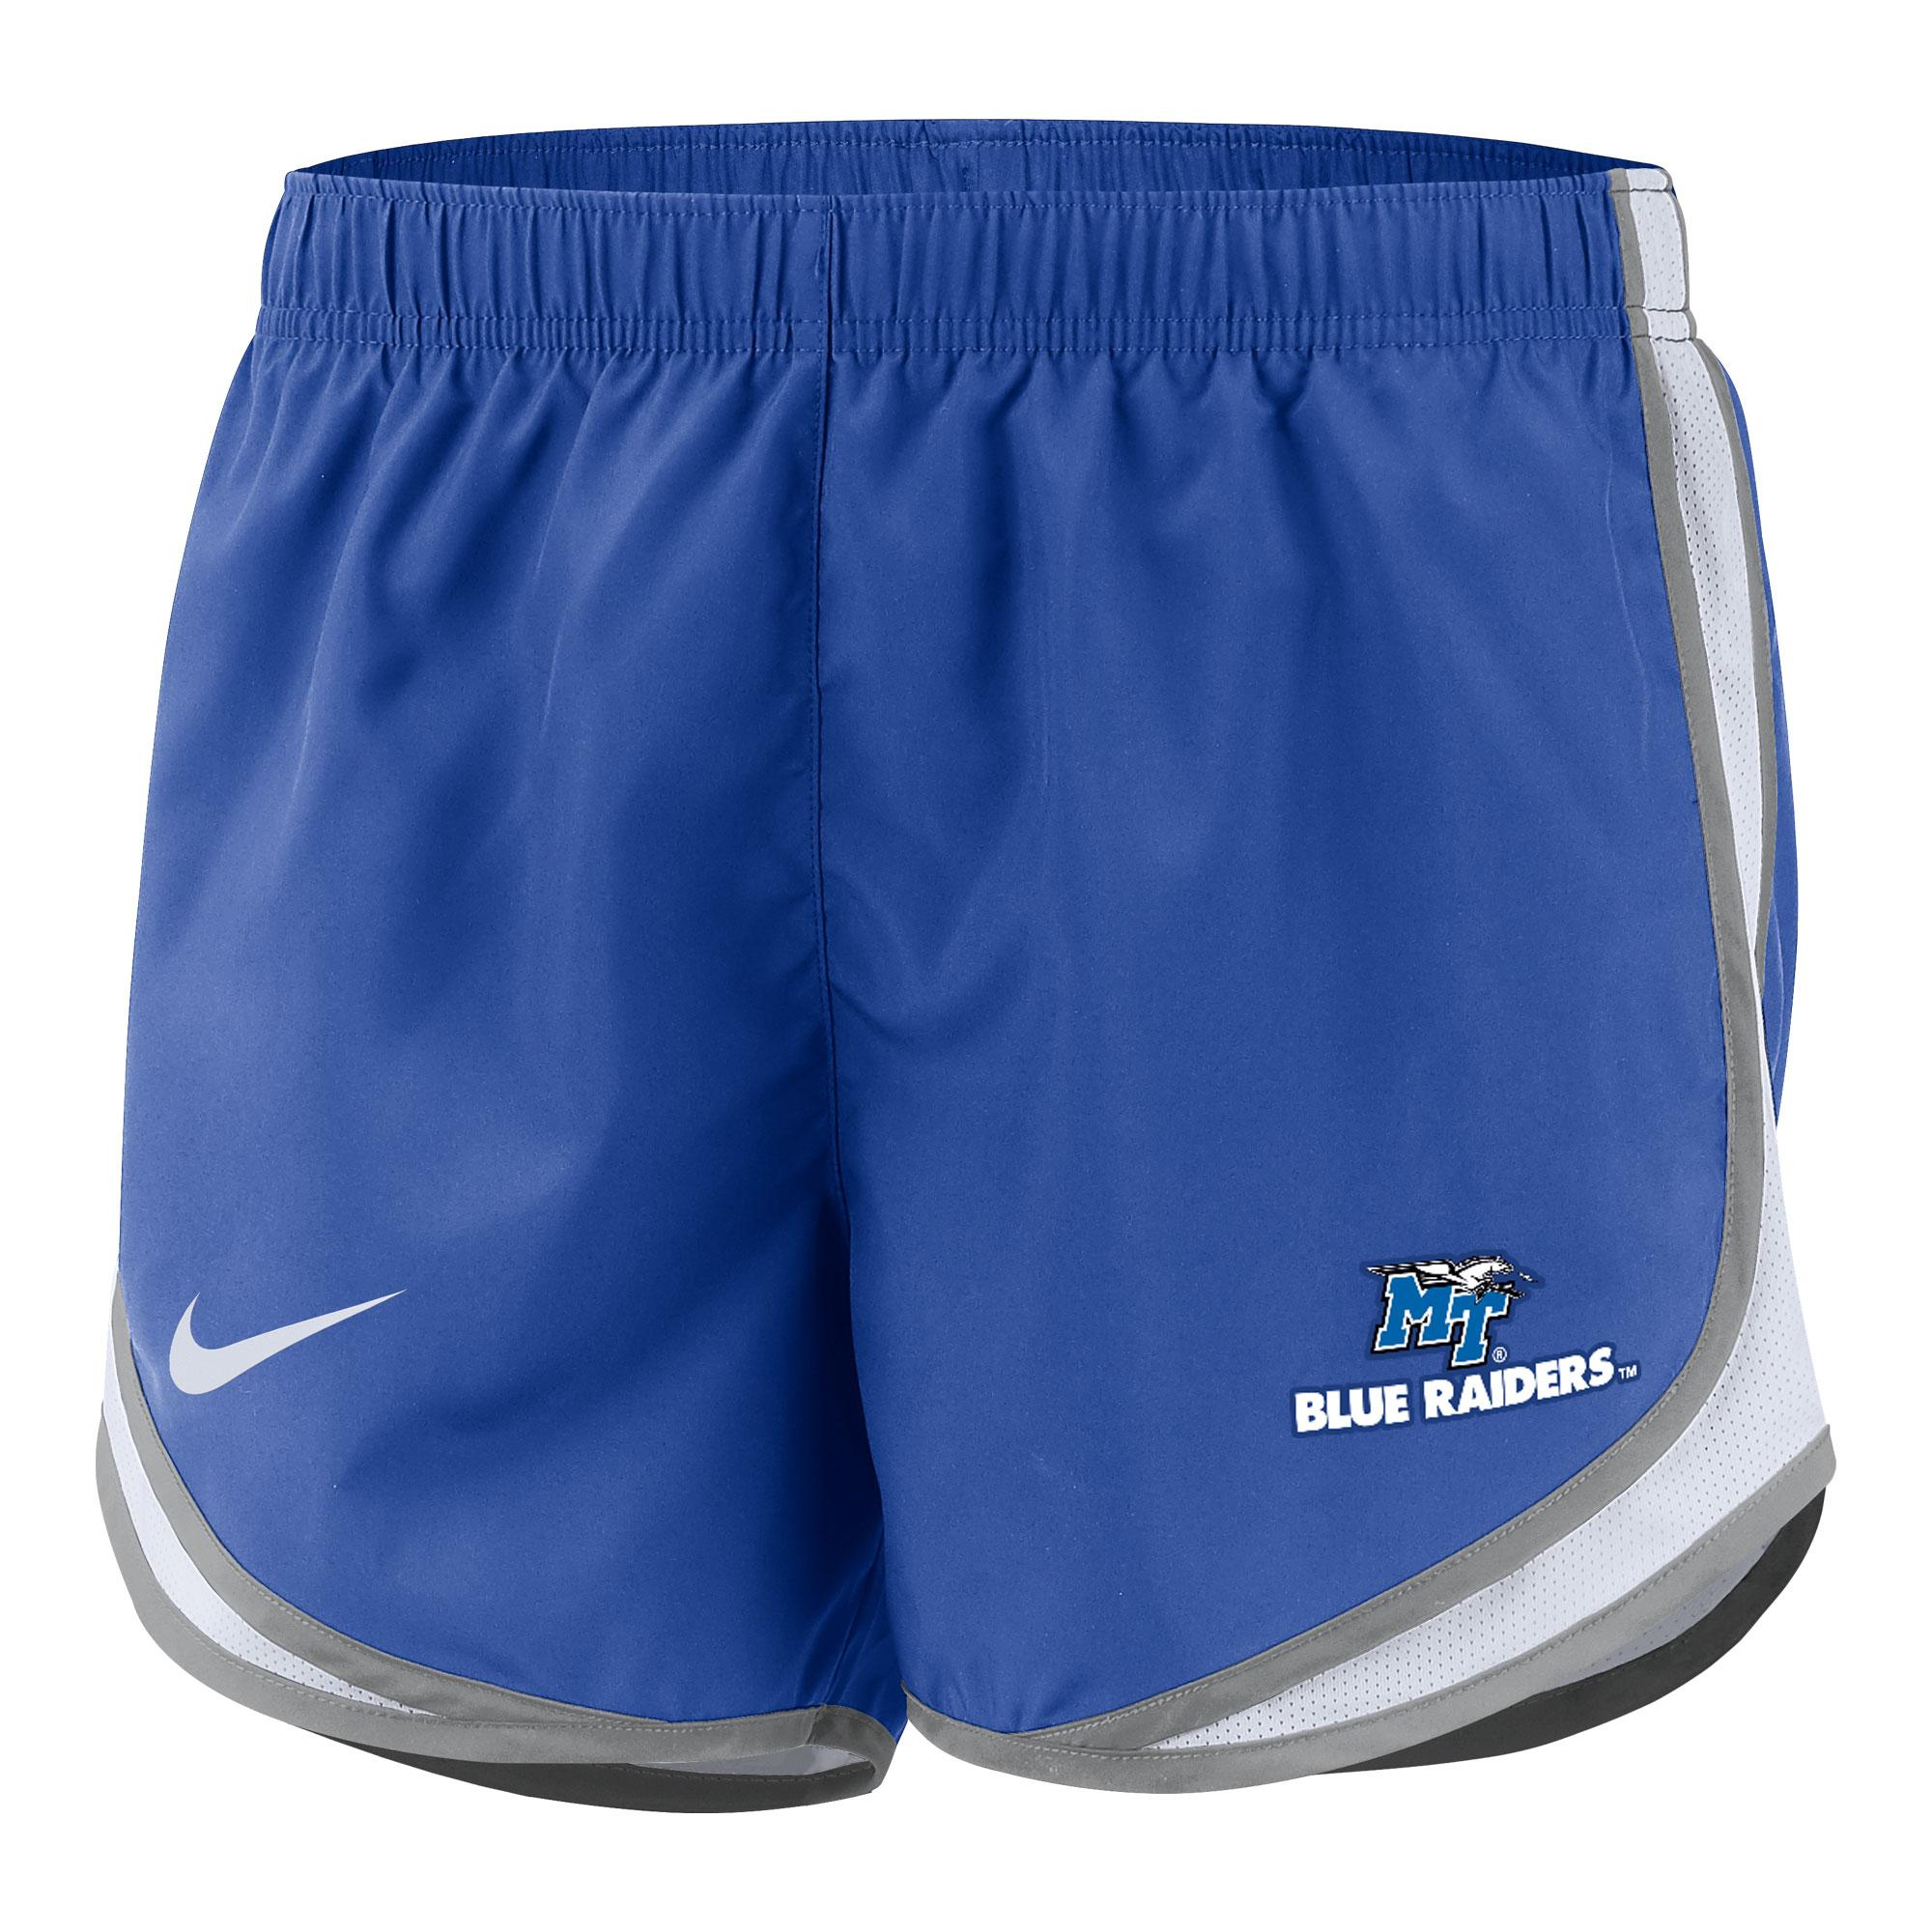 MT Blue Raiders Women's Nike® Tempo Shorts